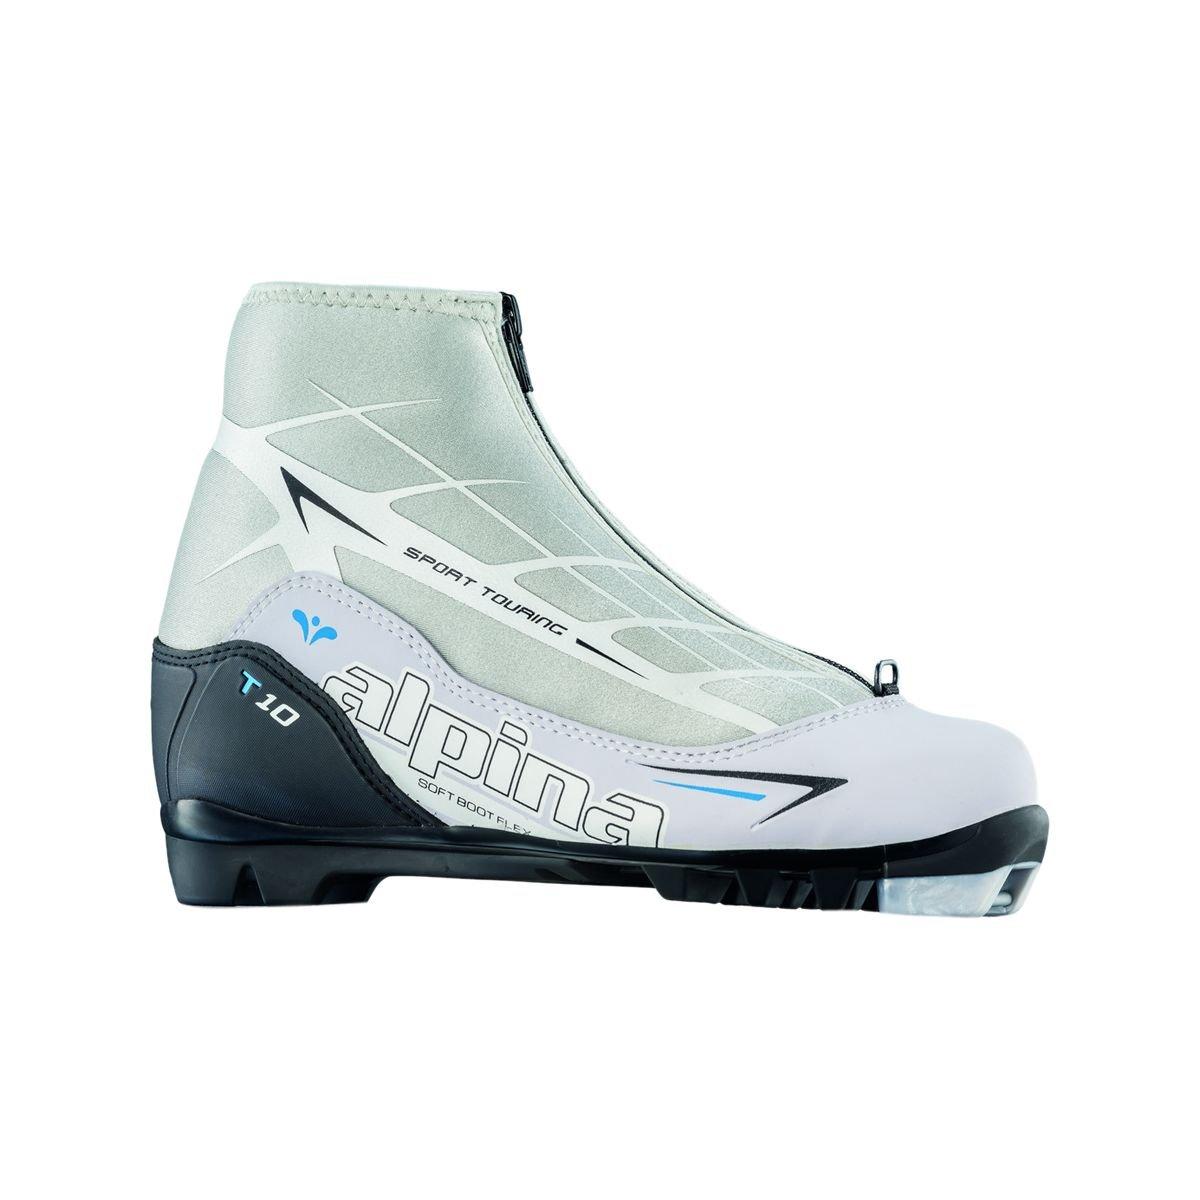 Alpina T10 Eve Touring Boot - Women's White/Black, 42.0